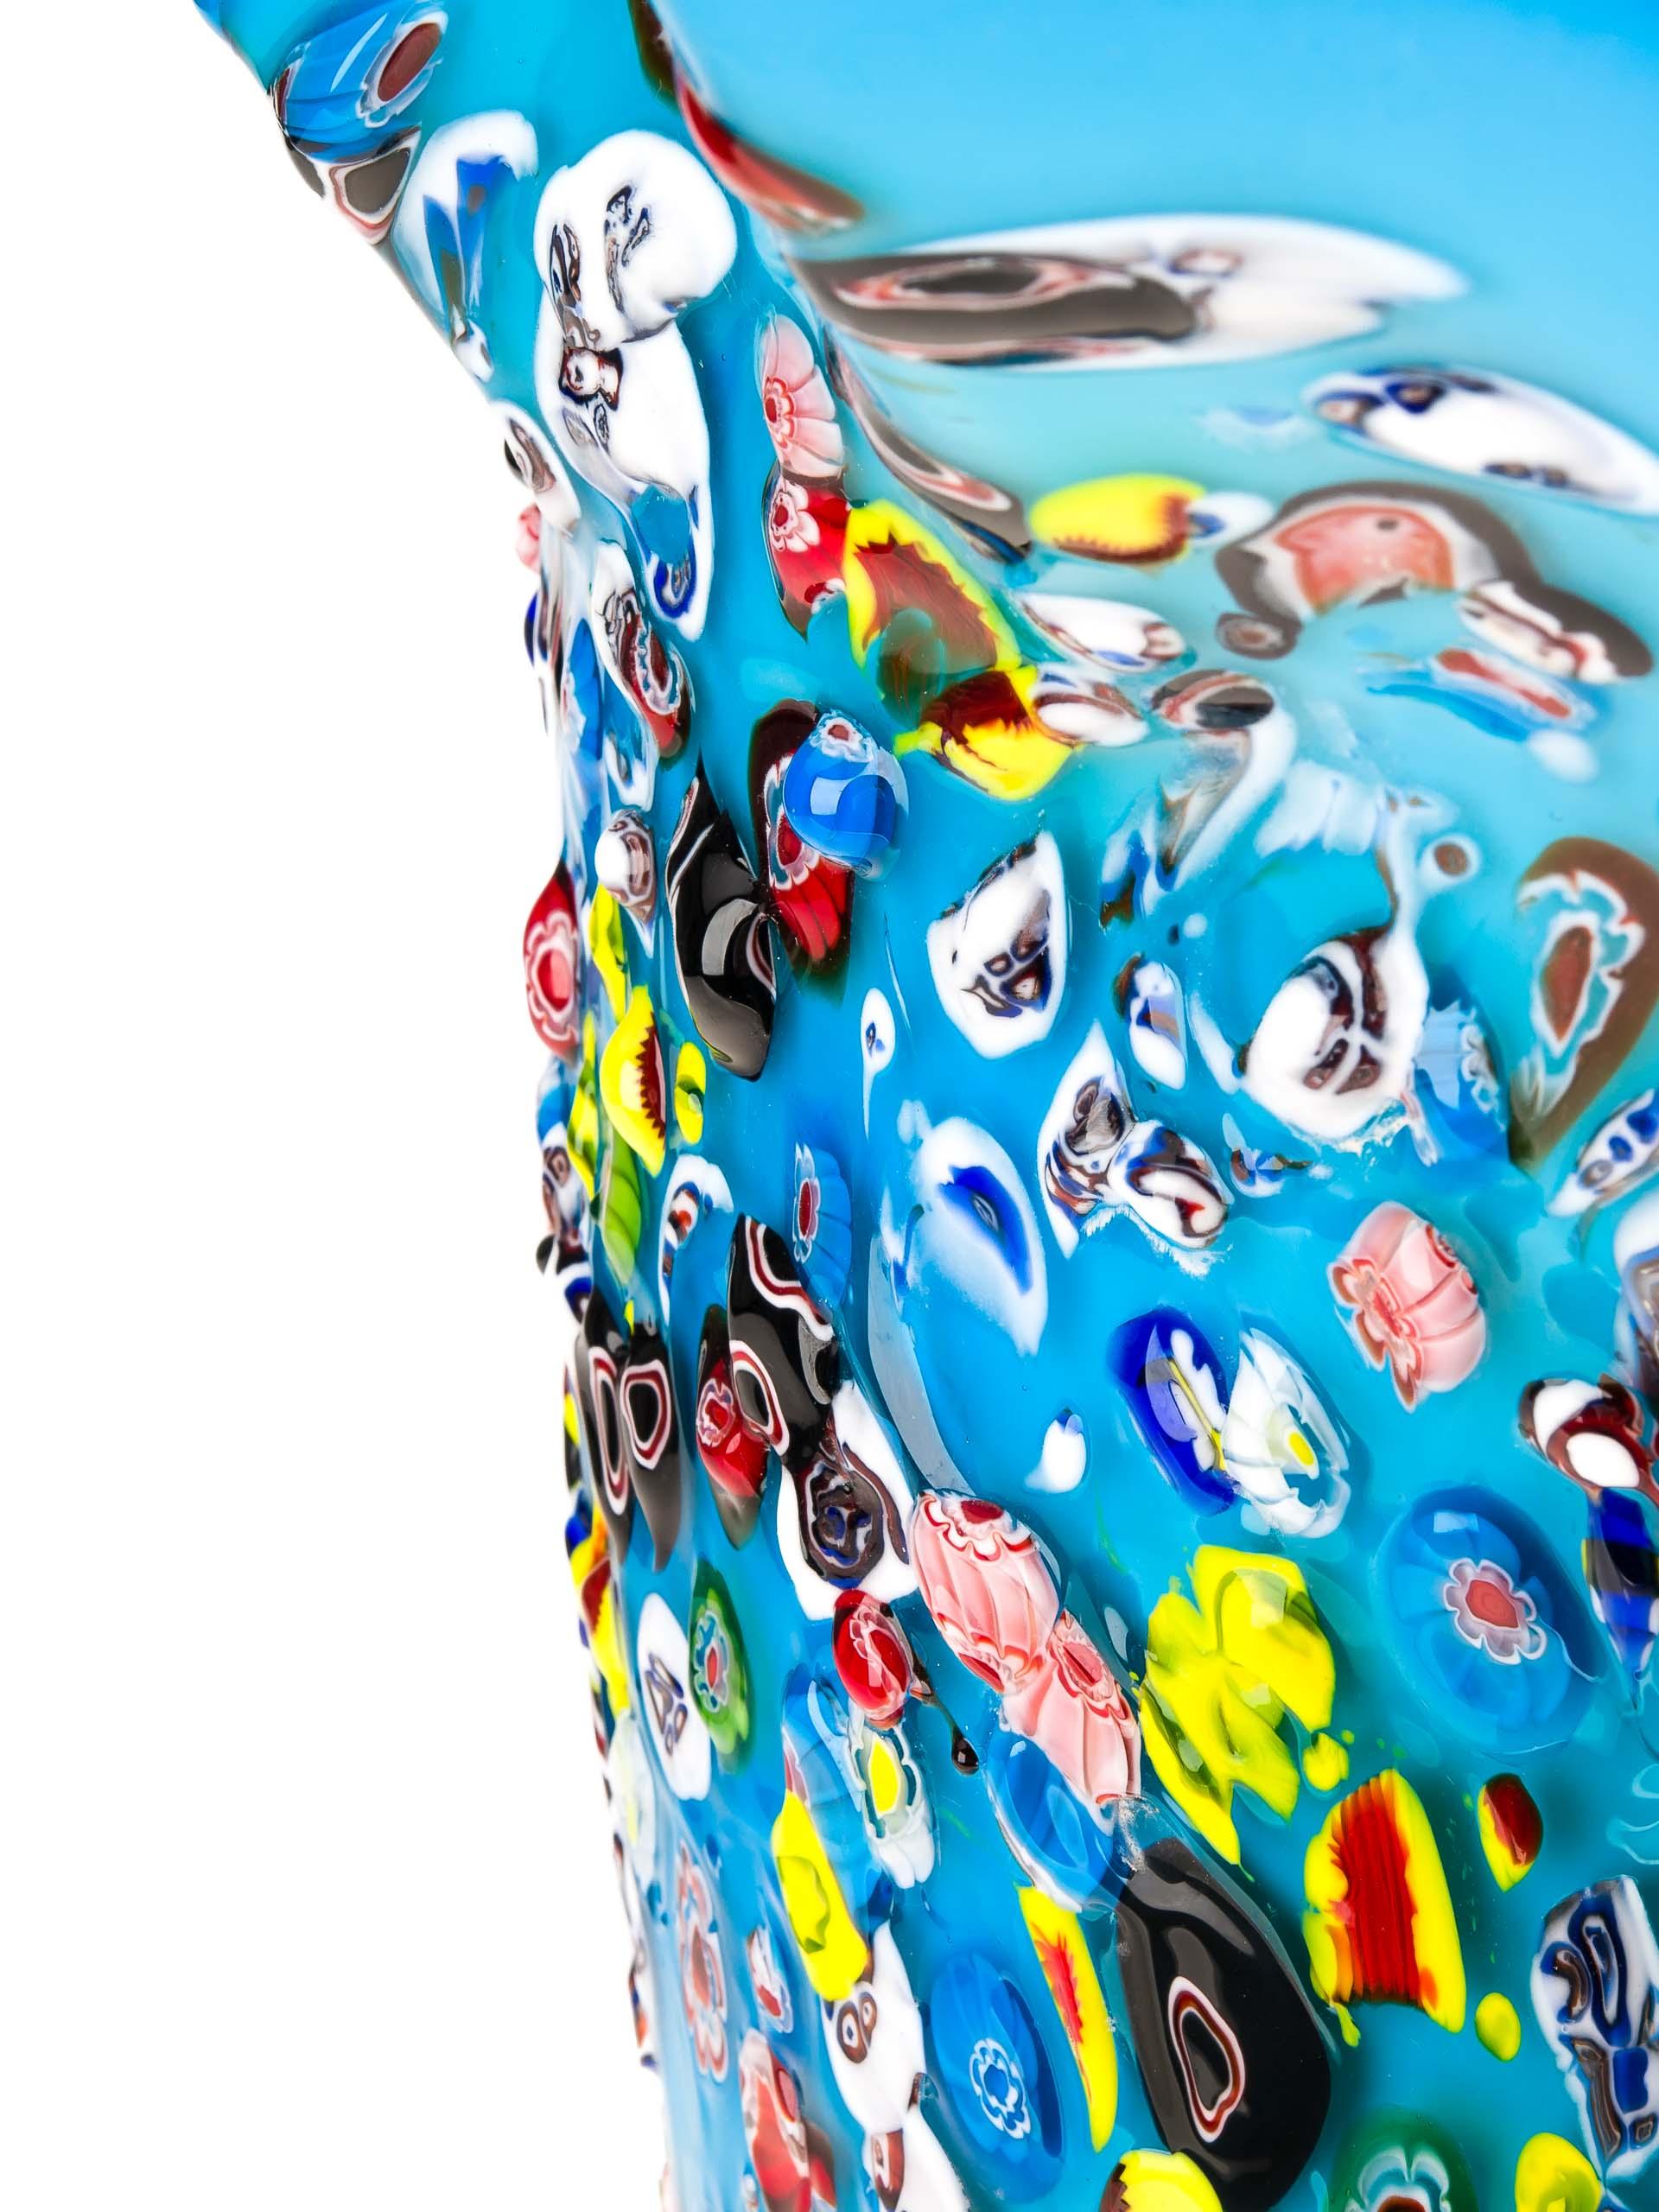 Glasvase Glas Vase im Italien Murano antik Stil 42cm schwere Tischvase glass